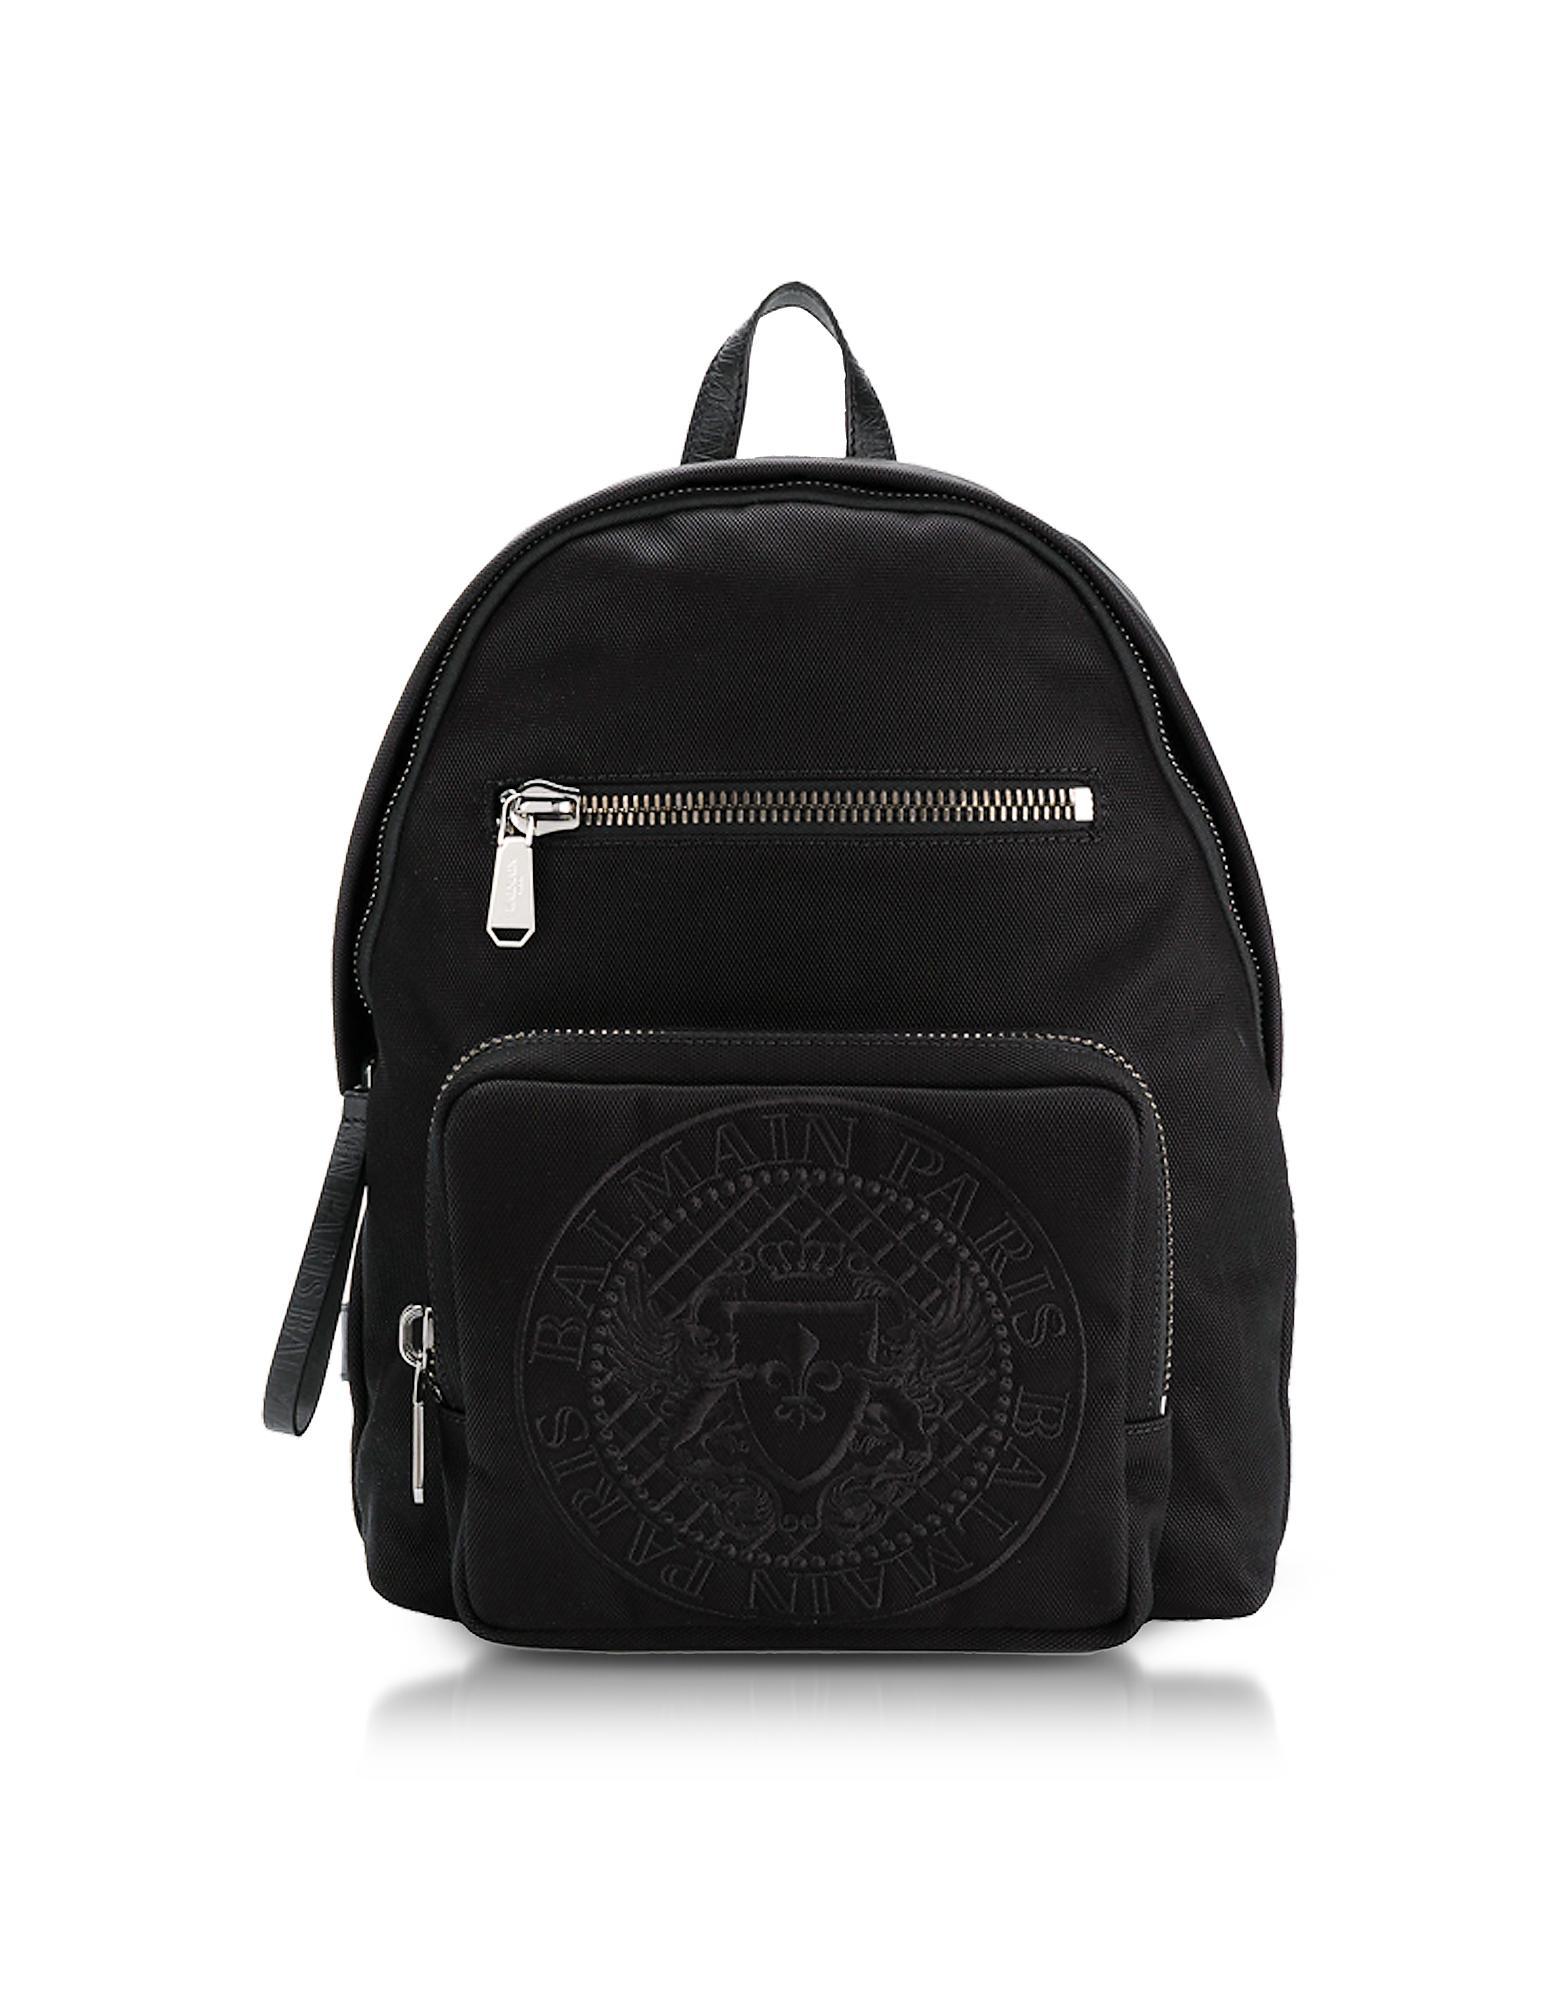 Balmain Backpacks, Nylon Men's Club Backpack w/Embossed Blazon